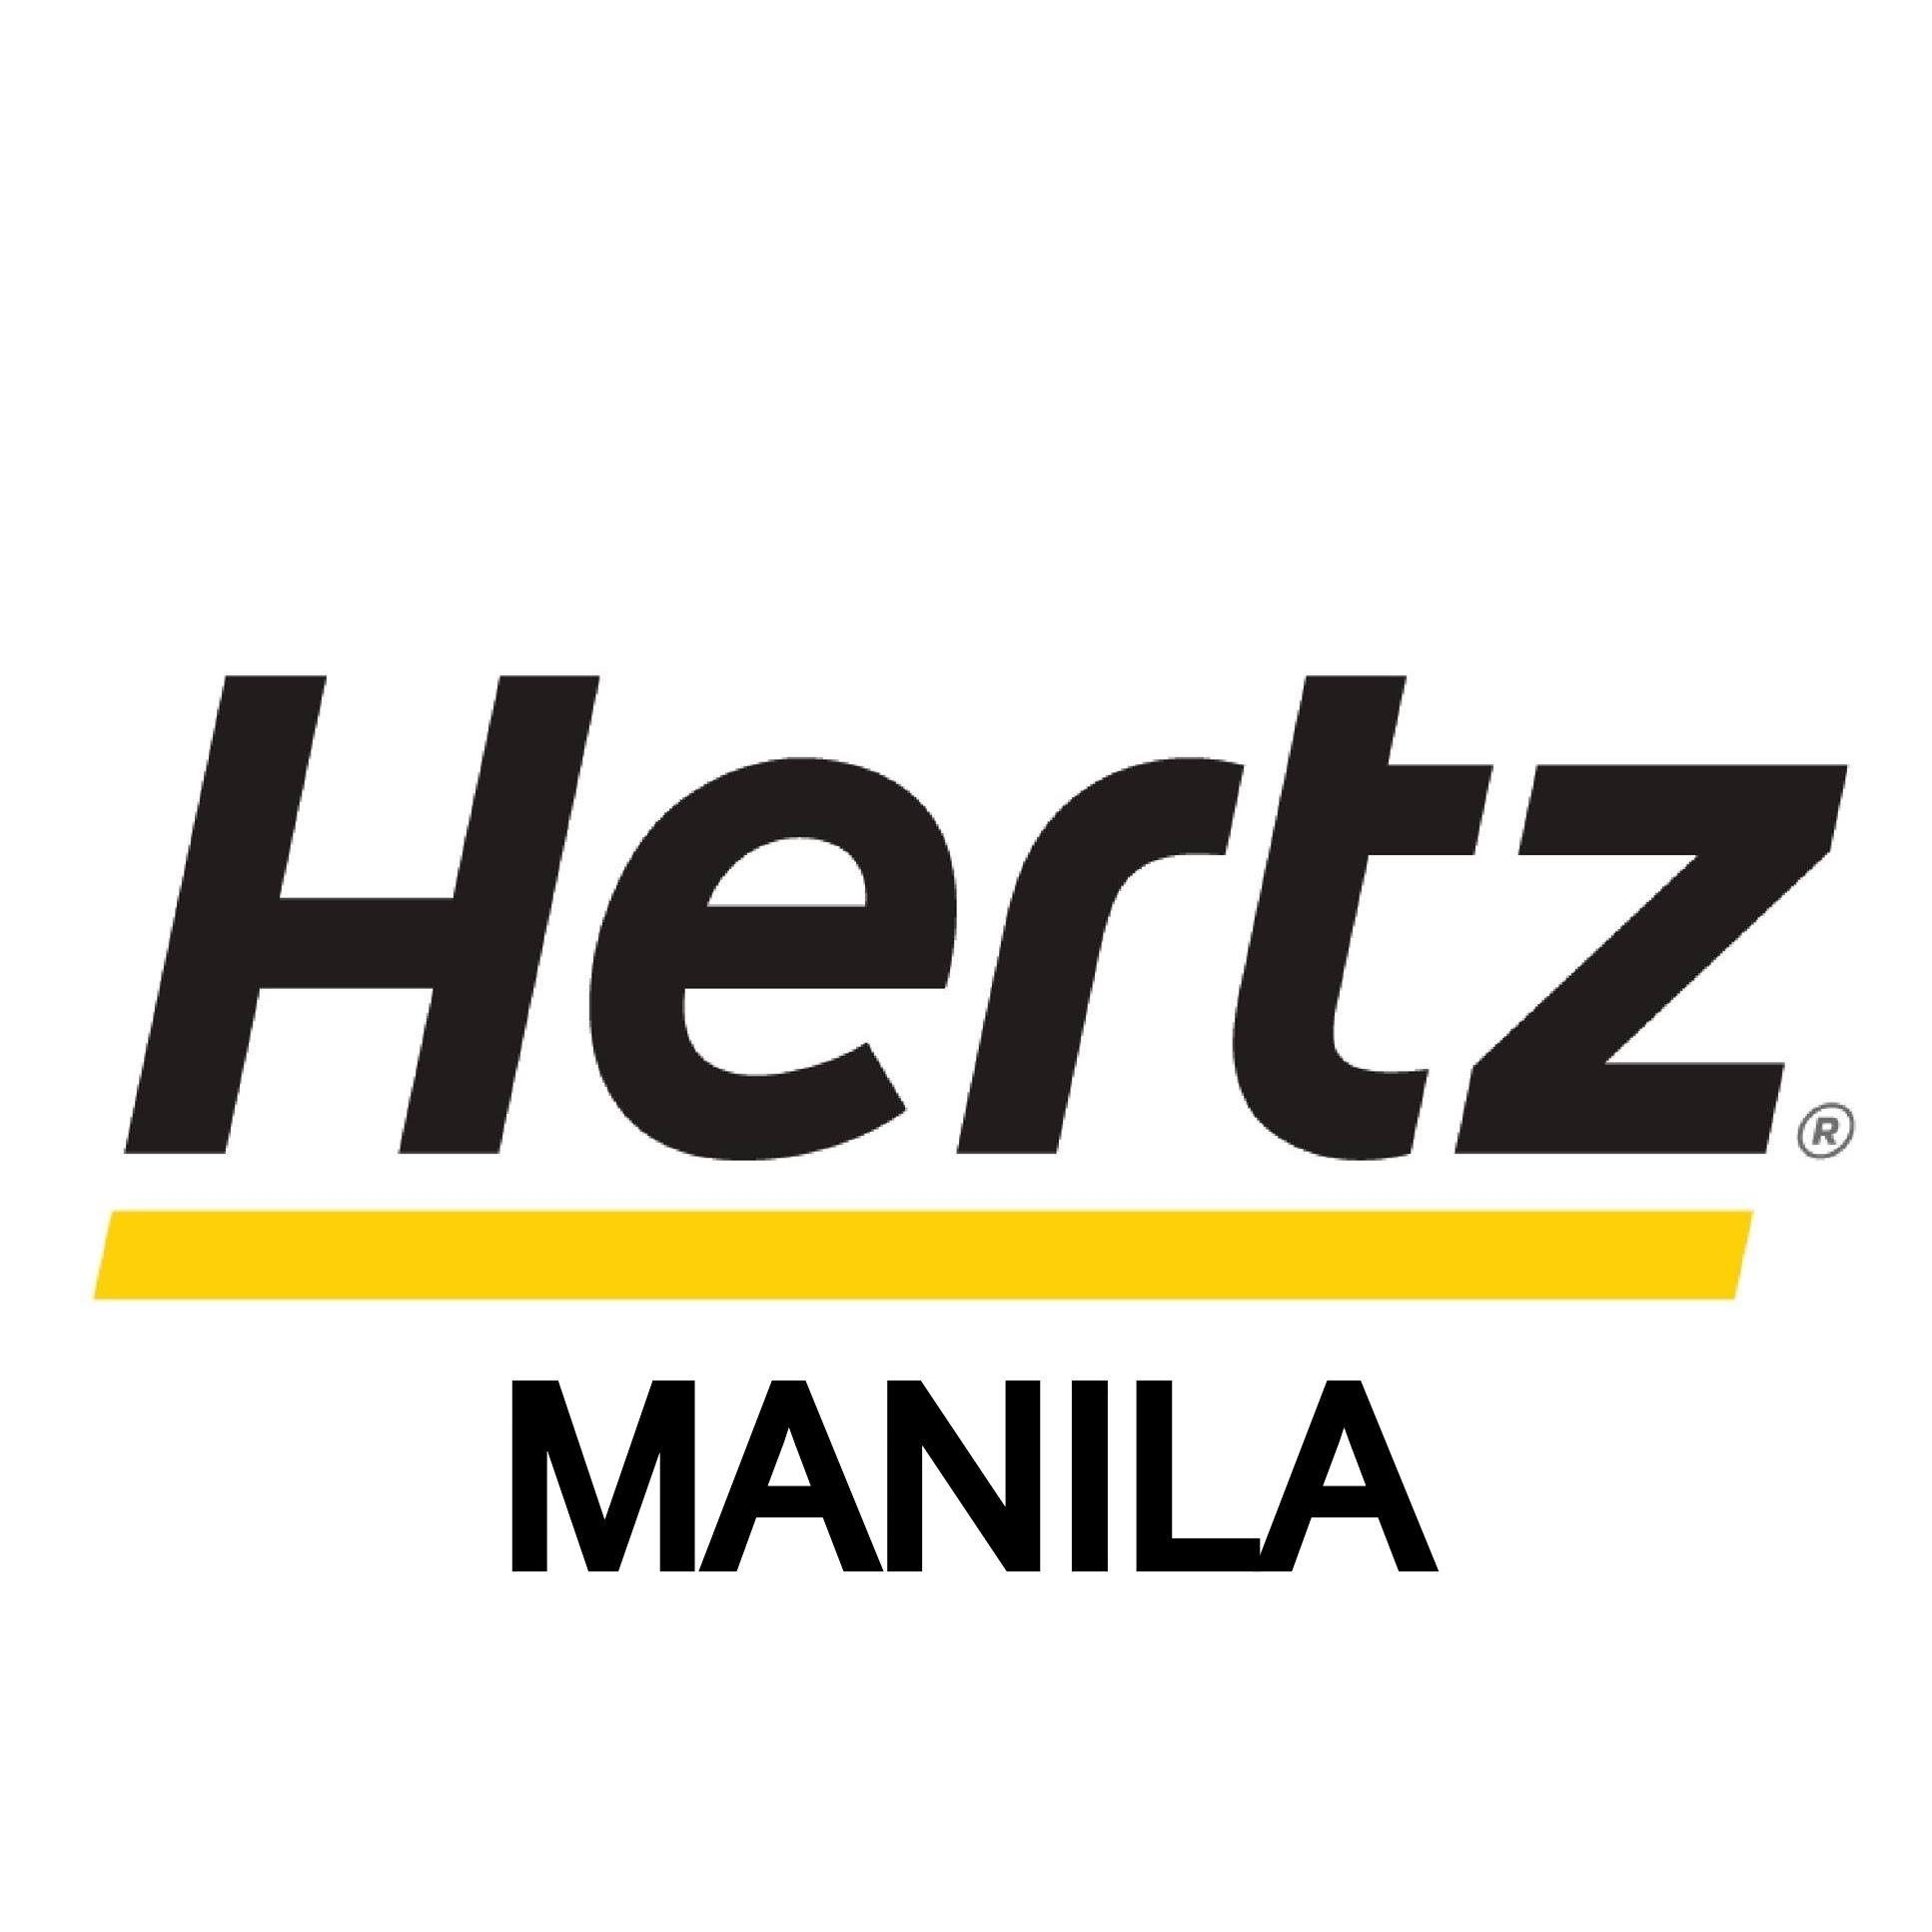 Hertz Manila.jpg